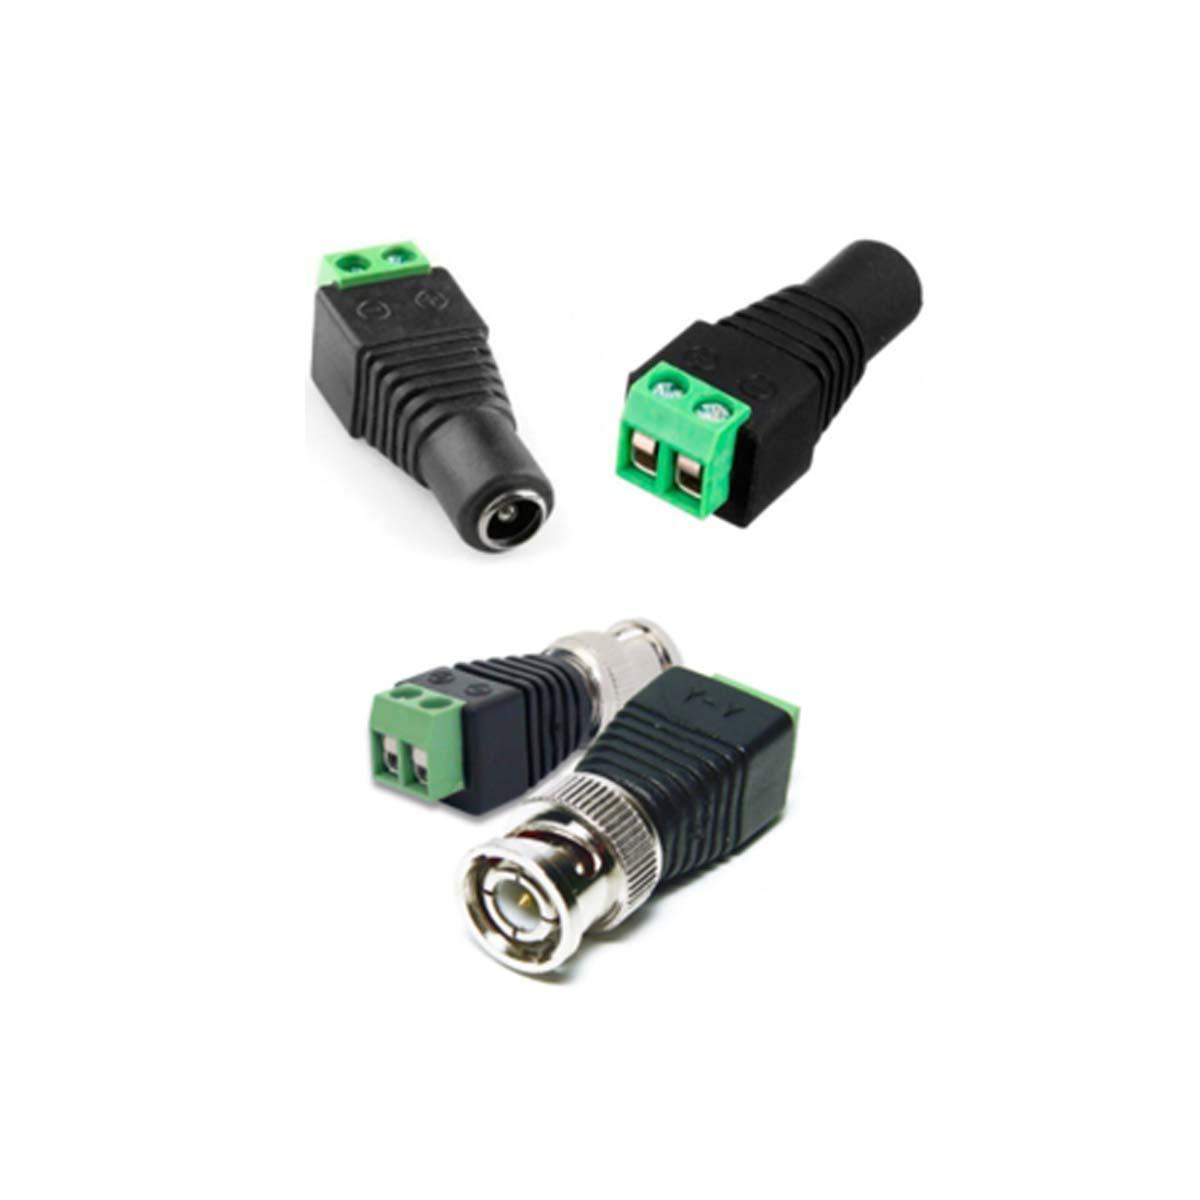 Kit CFTV 08 Câmeras VHD 1120 B G6 + MHDX 1108 S/ HD + Acessórios